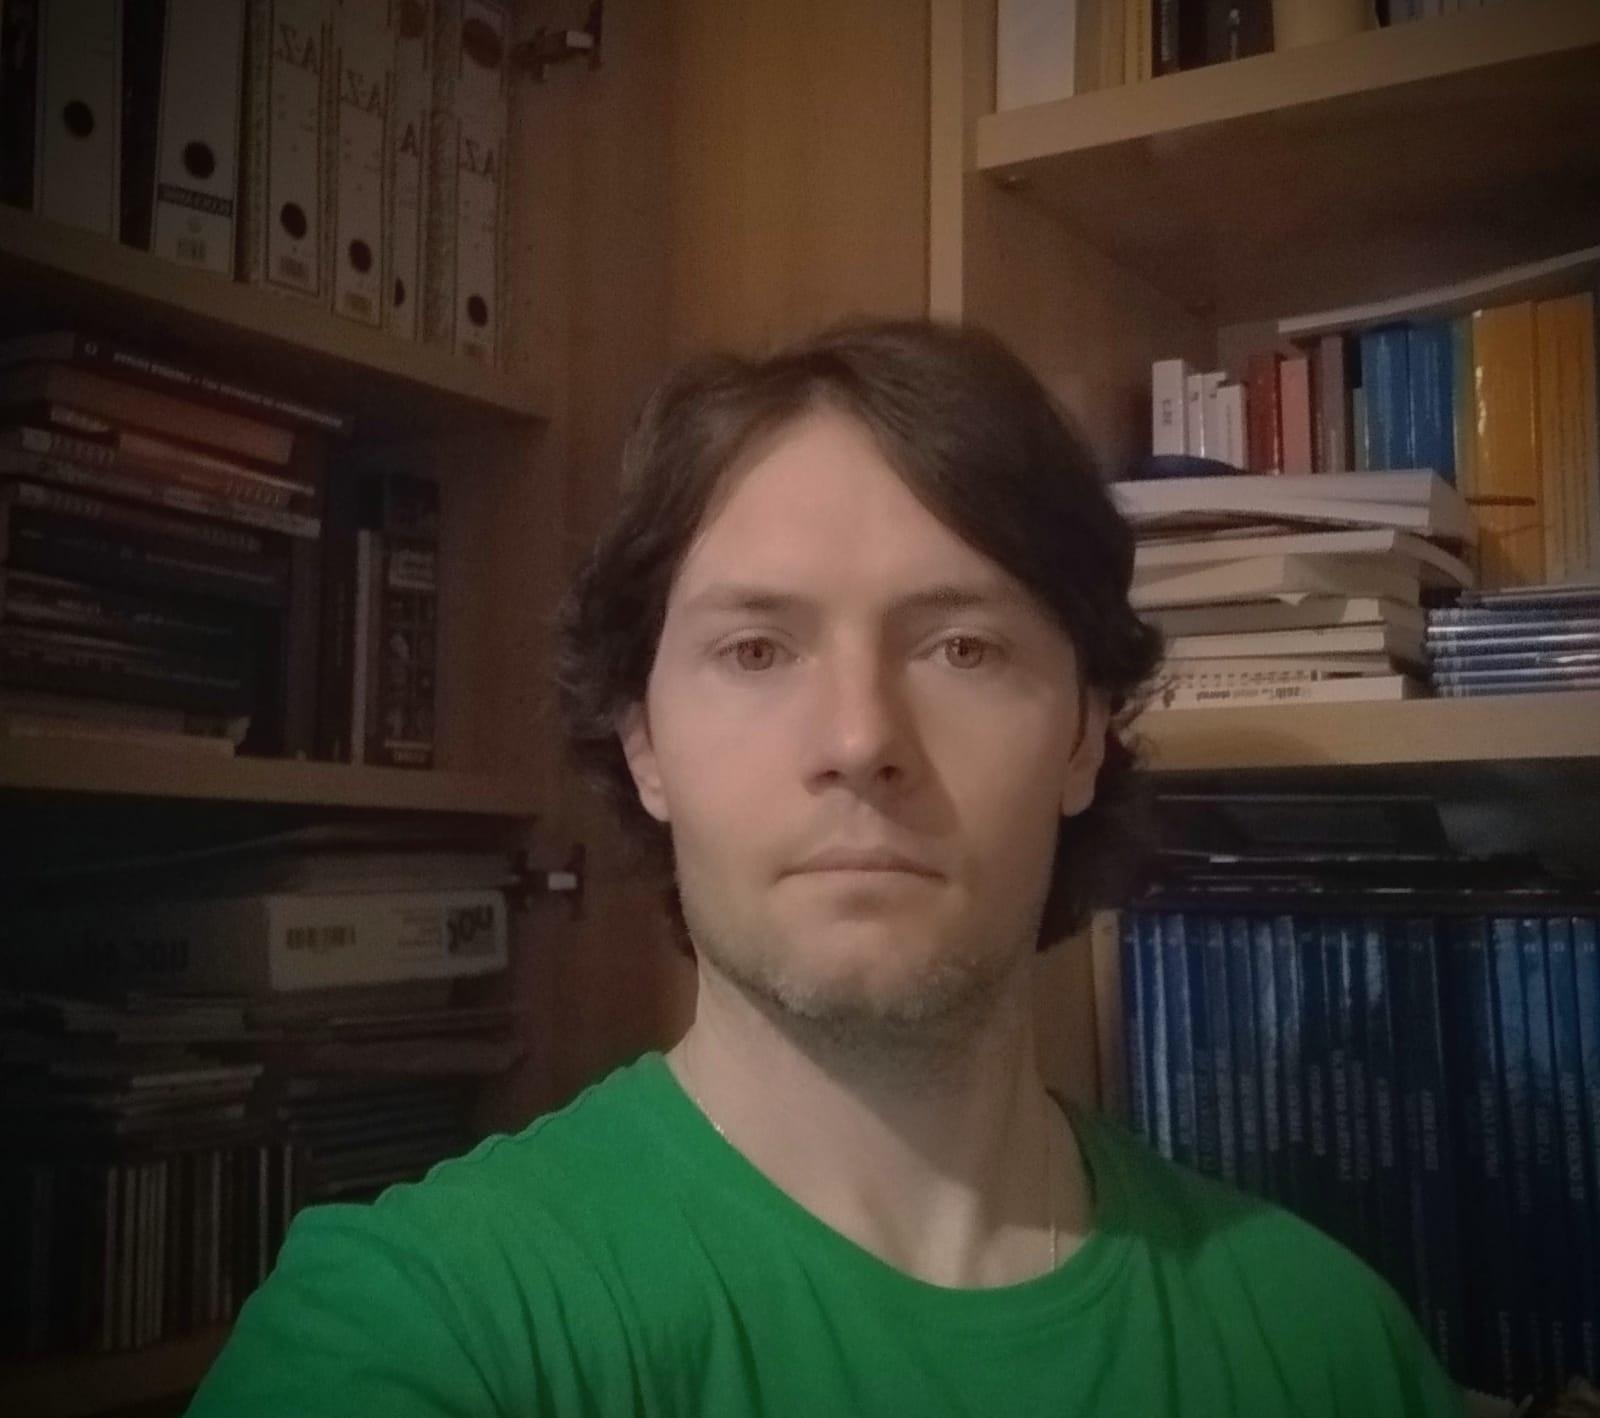 iu-verdes-se-eliminan-becas-para-pagar-uniformes-escolares